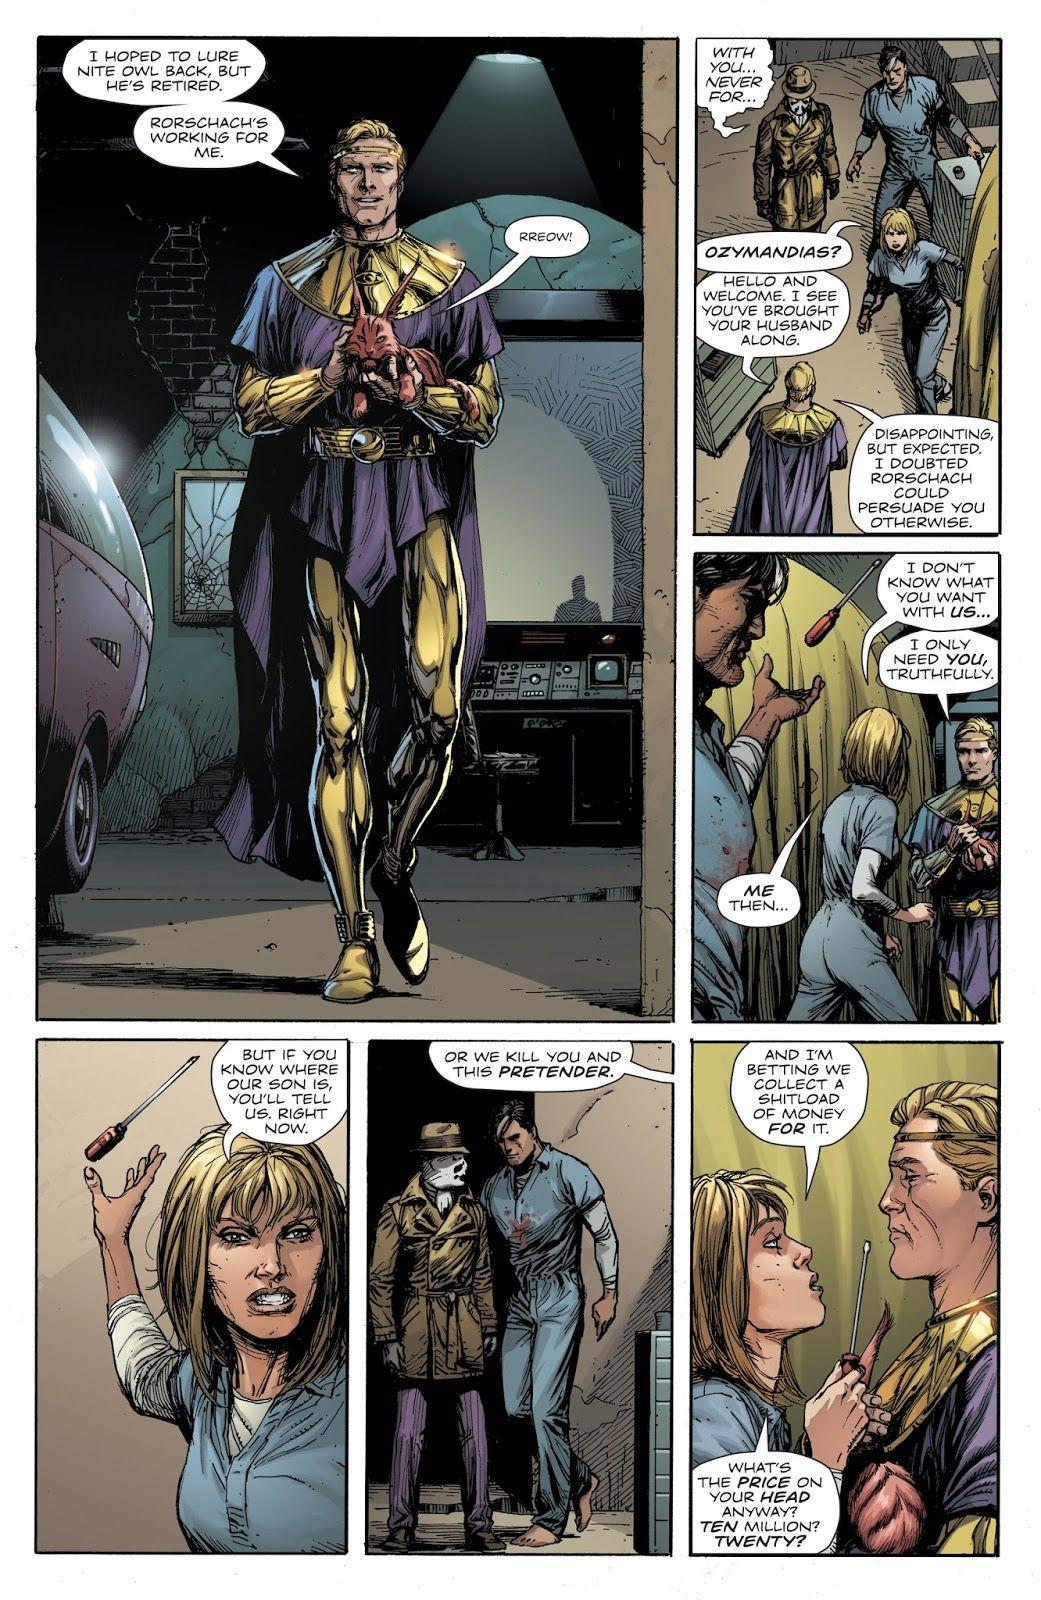 Doomsday Clock Issue 1 Read Doomsday Clock Issue 1 Comic